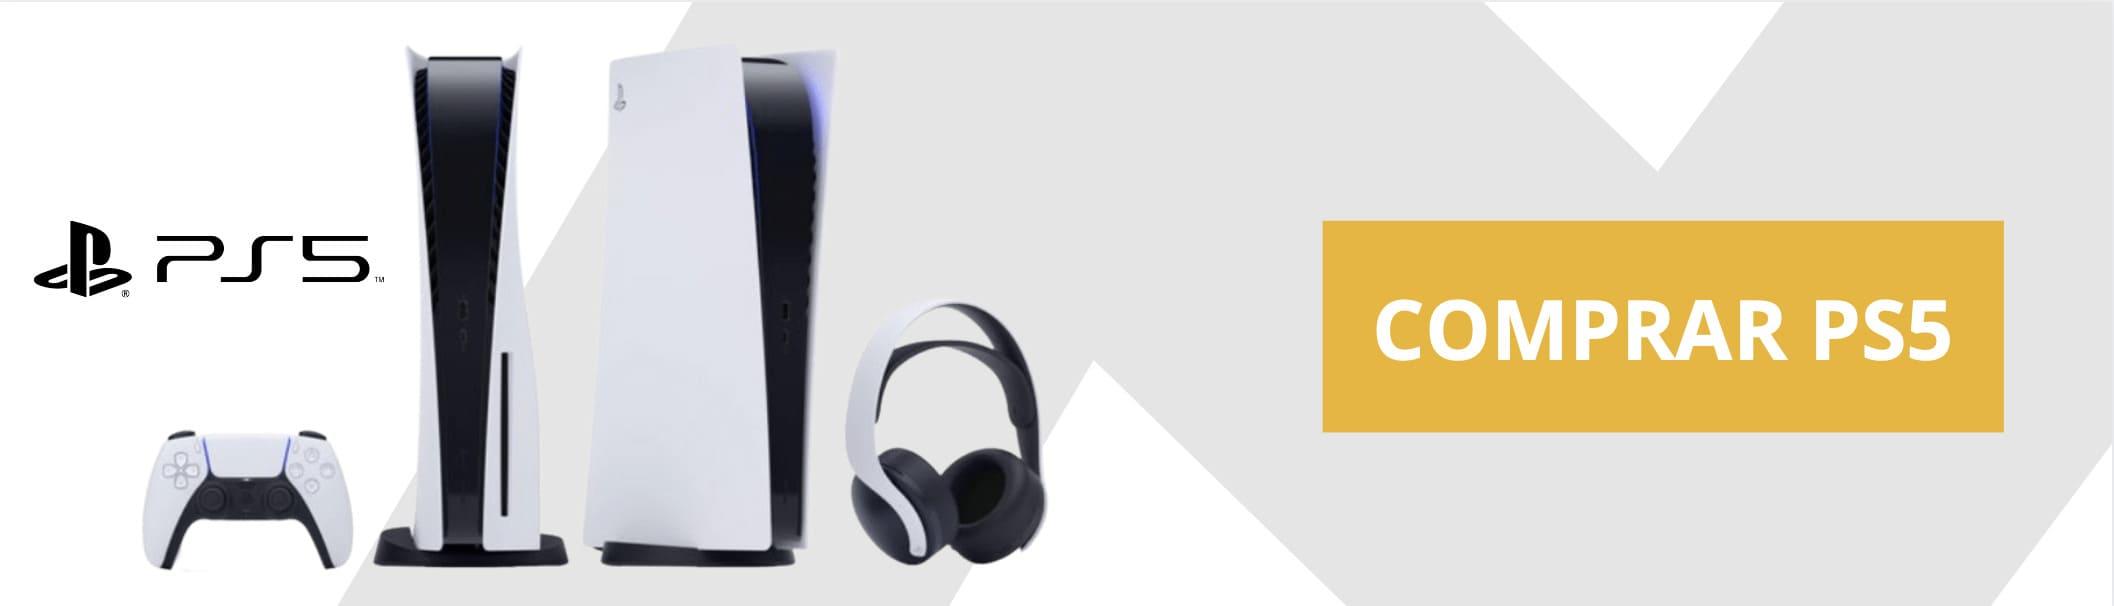 Comprar PS5 Amazon